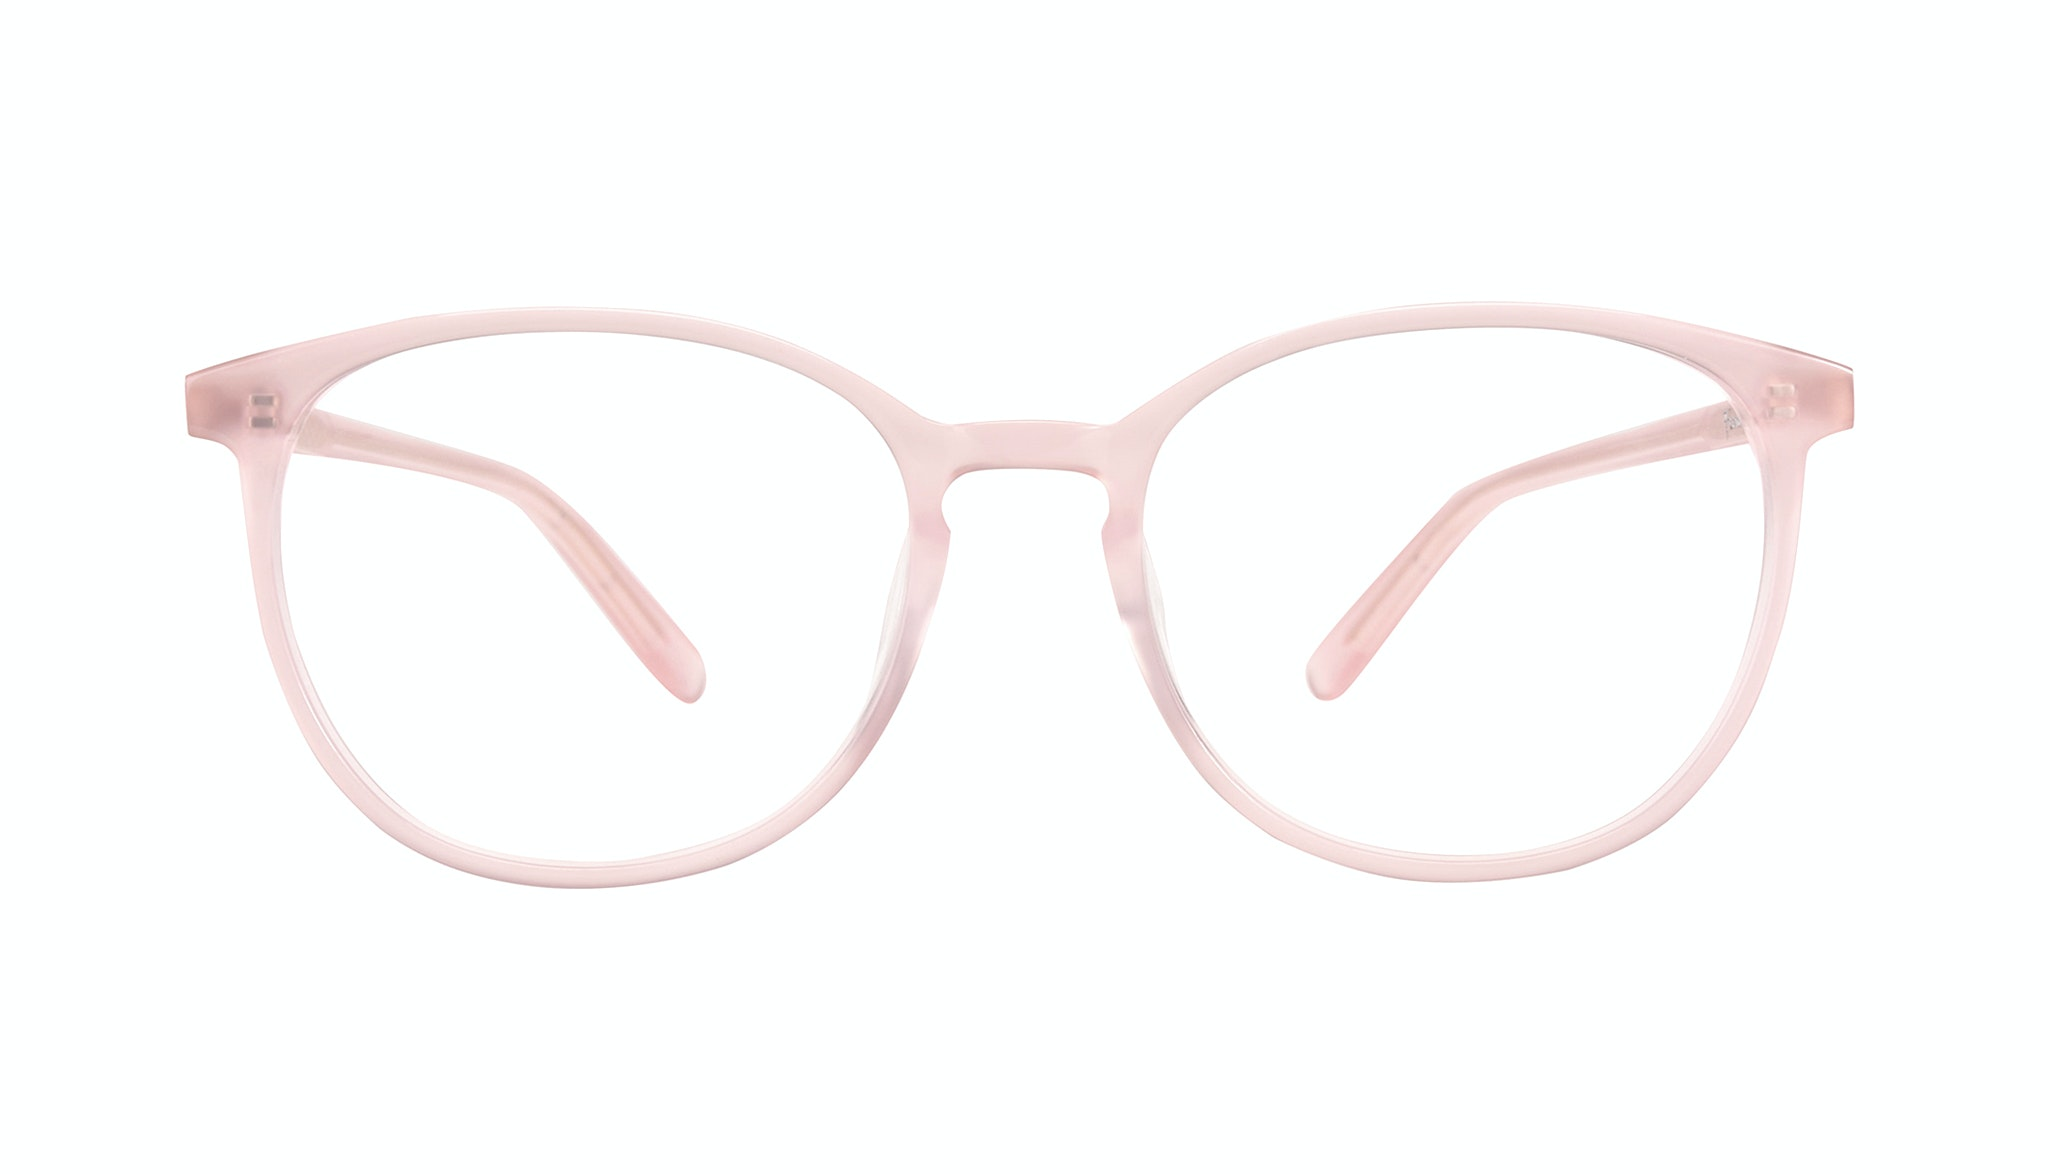 Affordable Fashion Glasses Round Eyeglasses Women Femme Libre Mila